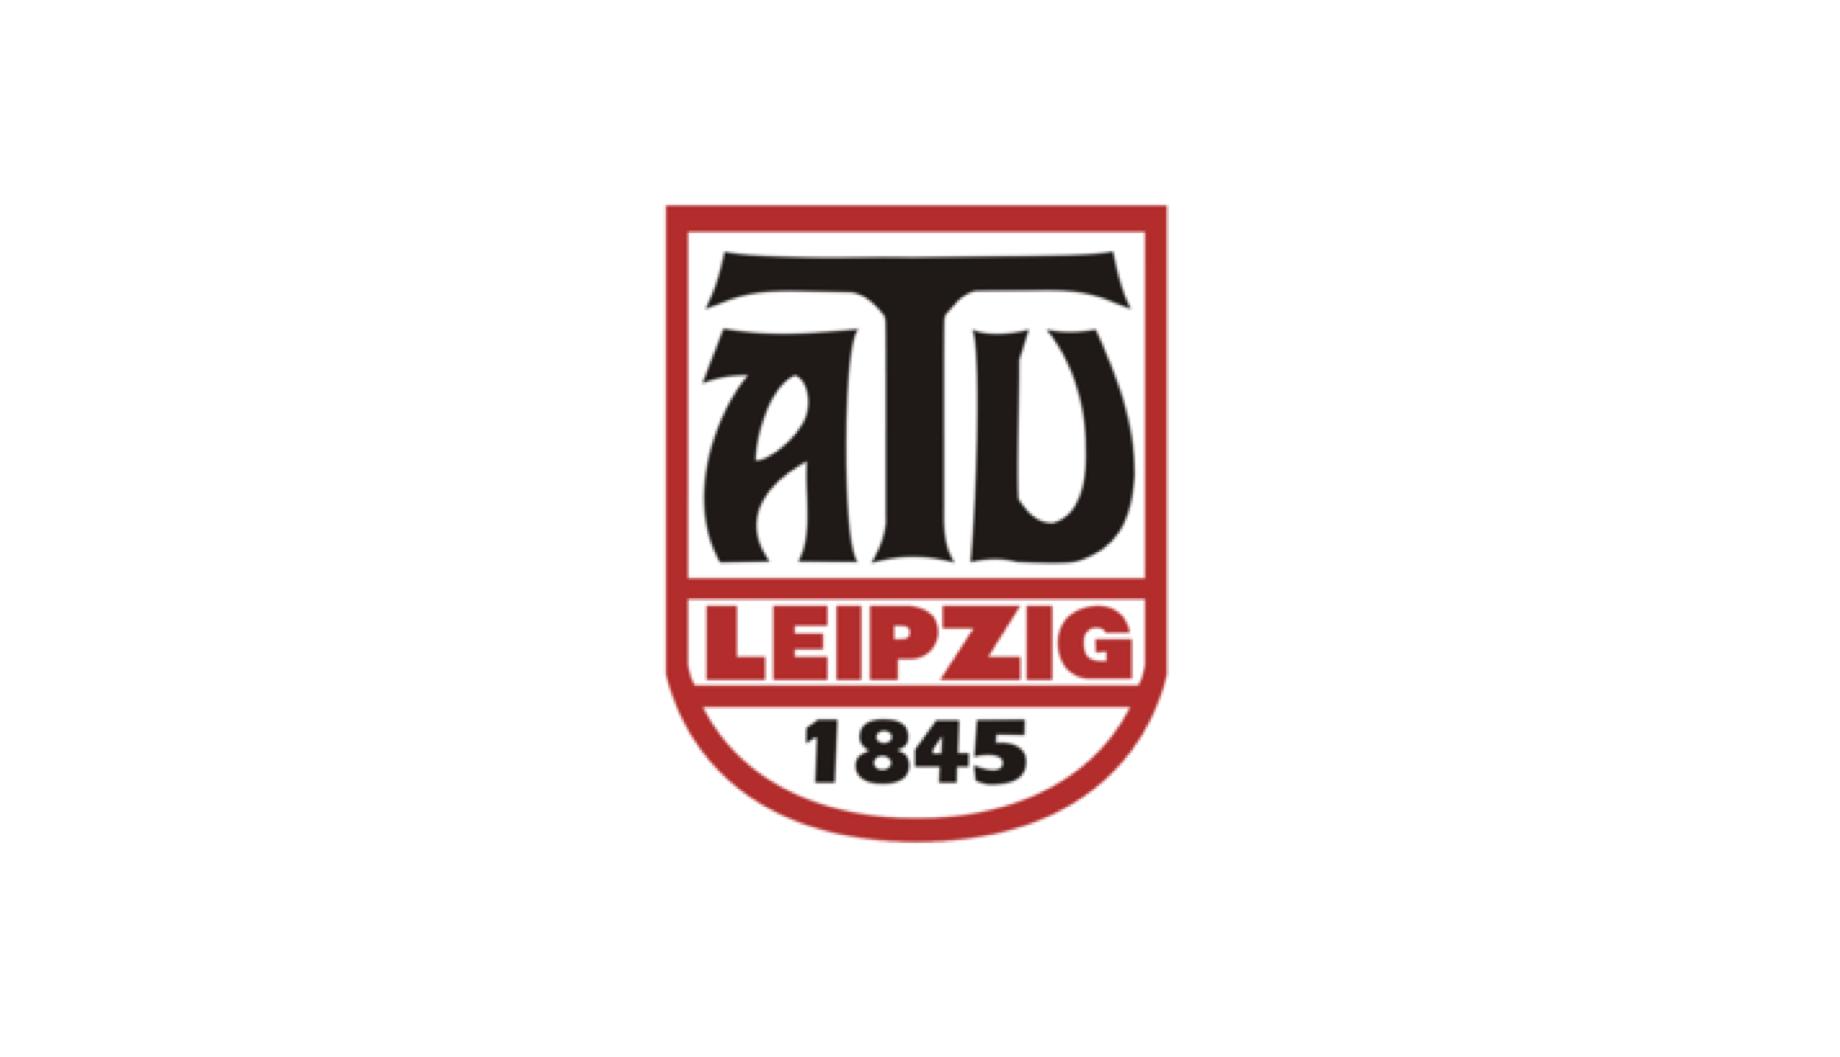 ATV Leipzig 1845